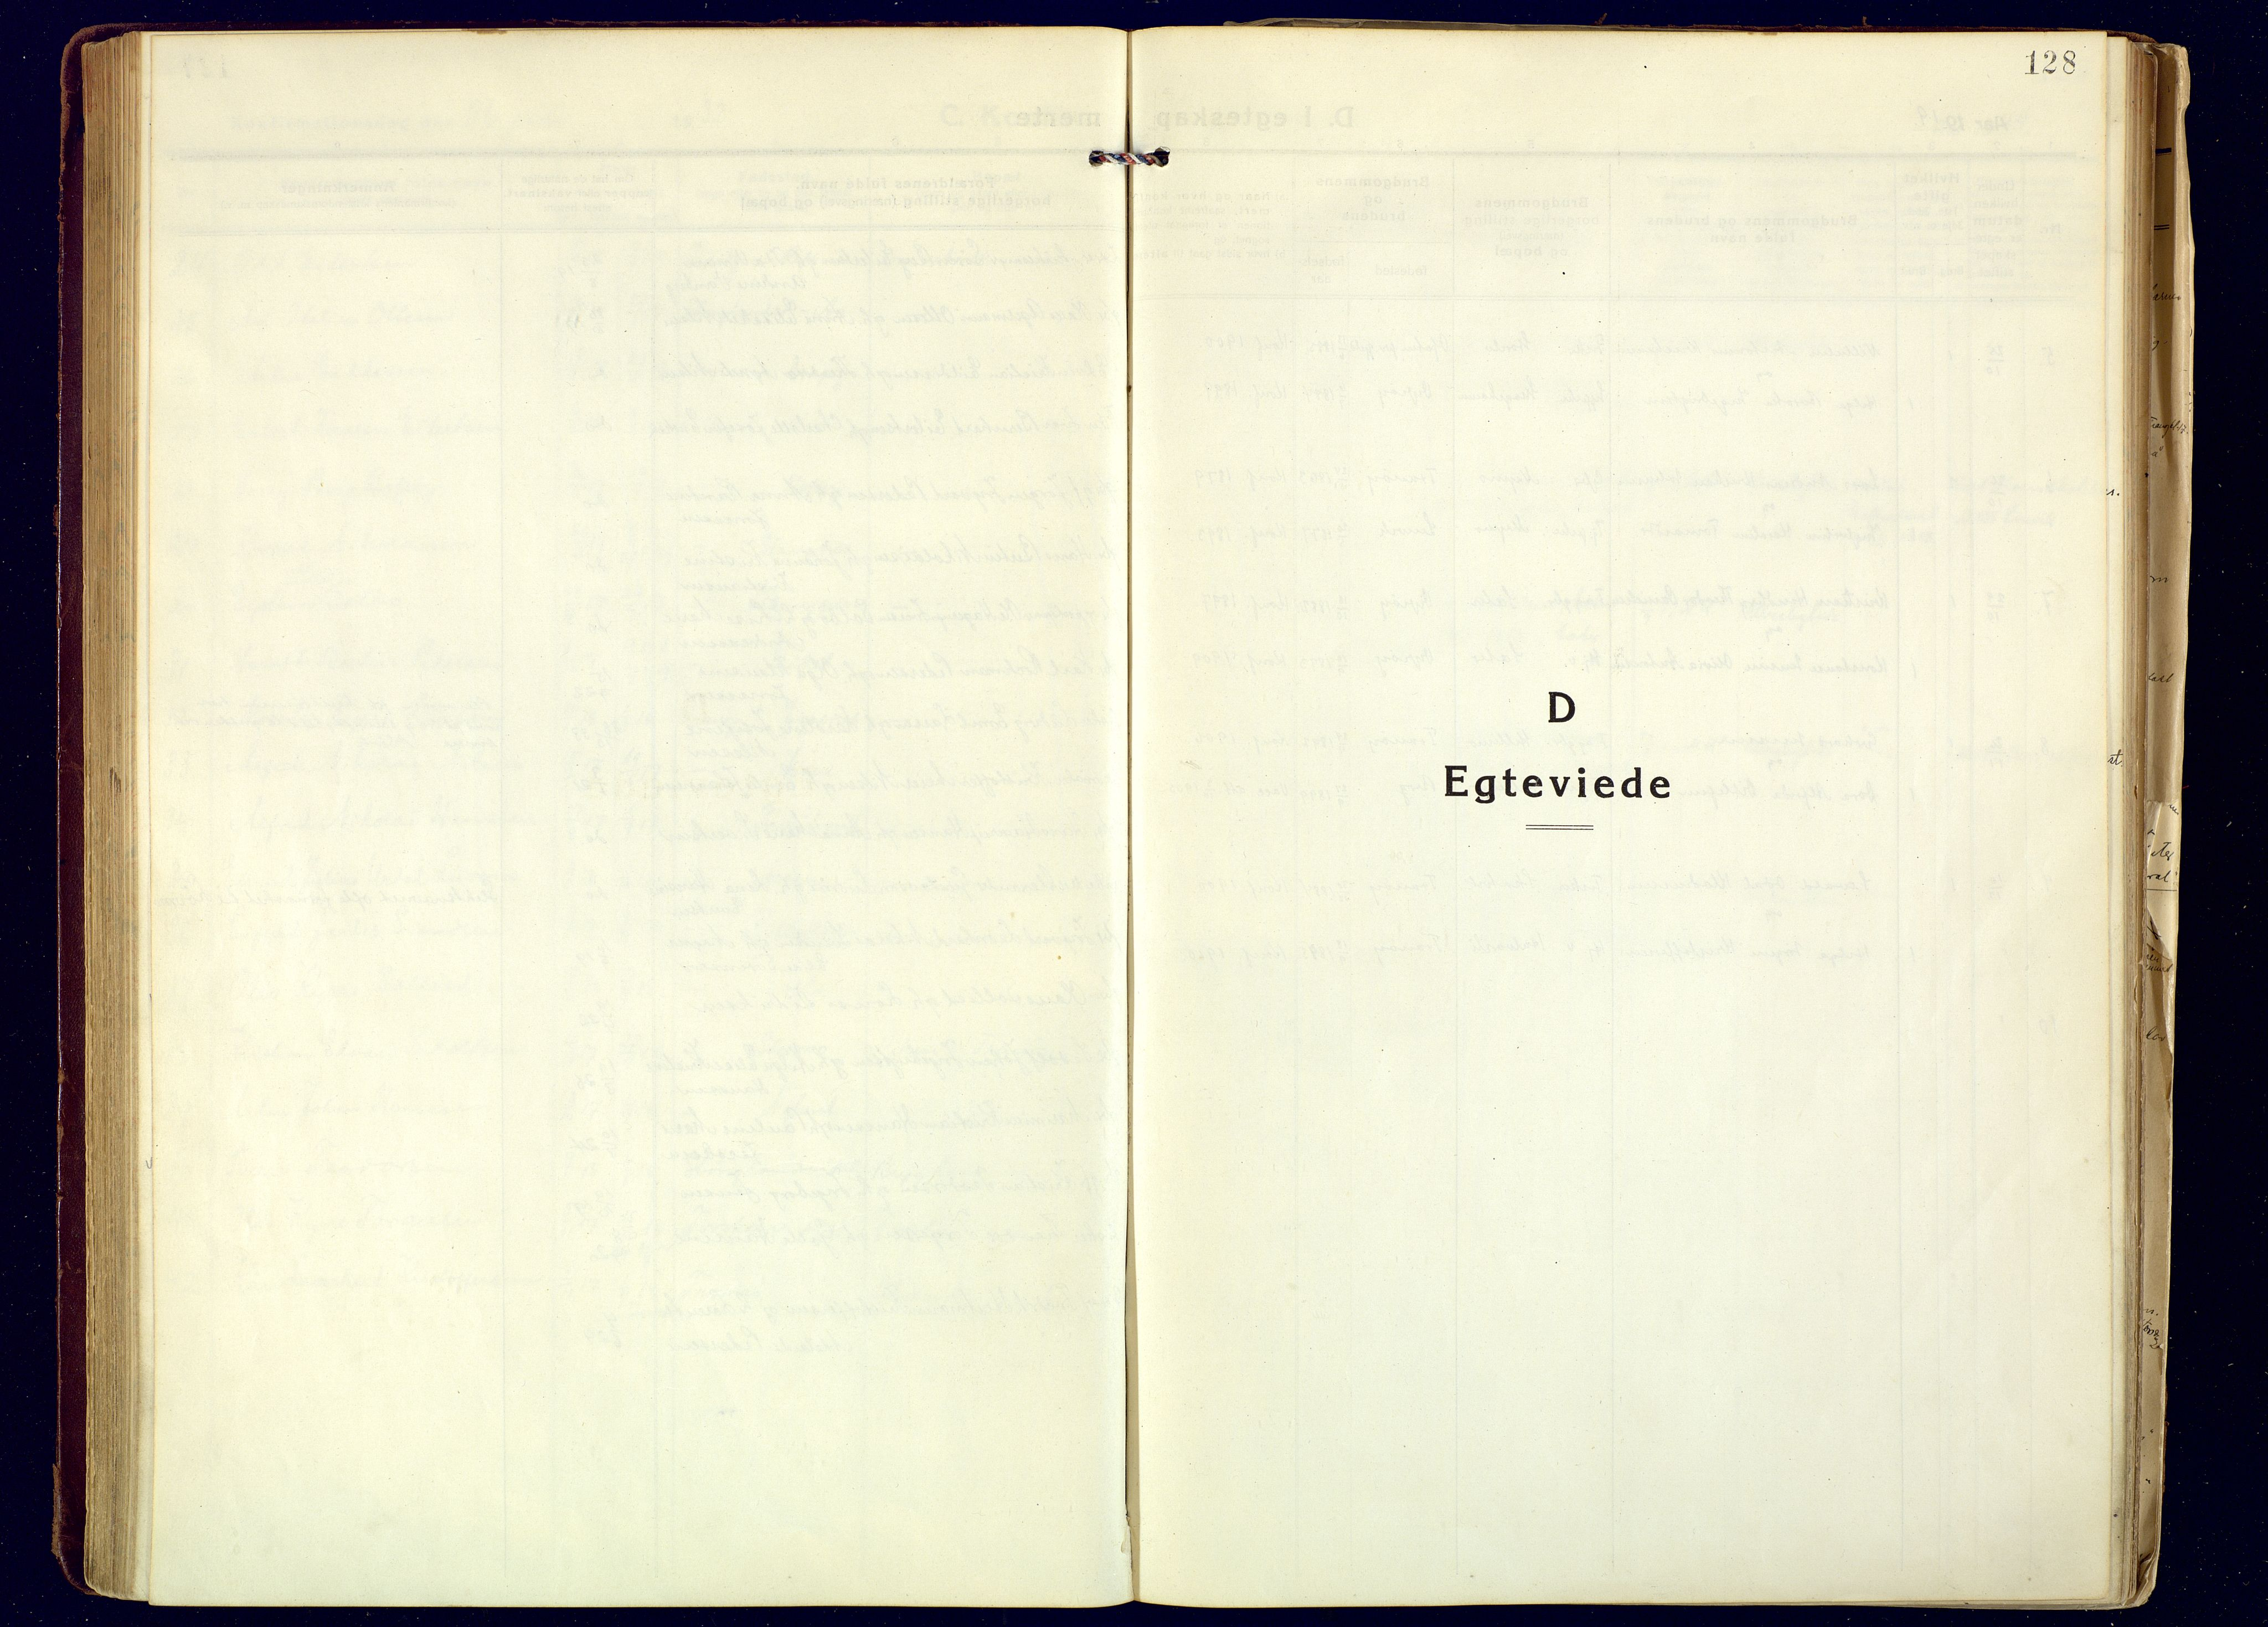 SATØ, Tranøy sokneprestkontor, I/Ia/Iaa: Ministerialbok nr. 16, 1919-1932, s. 128